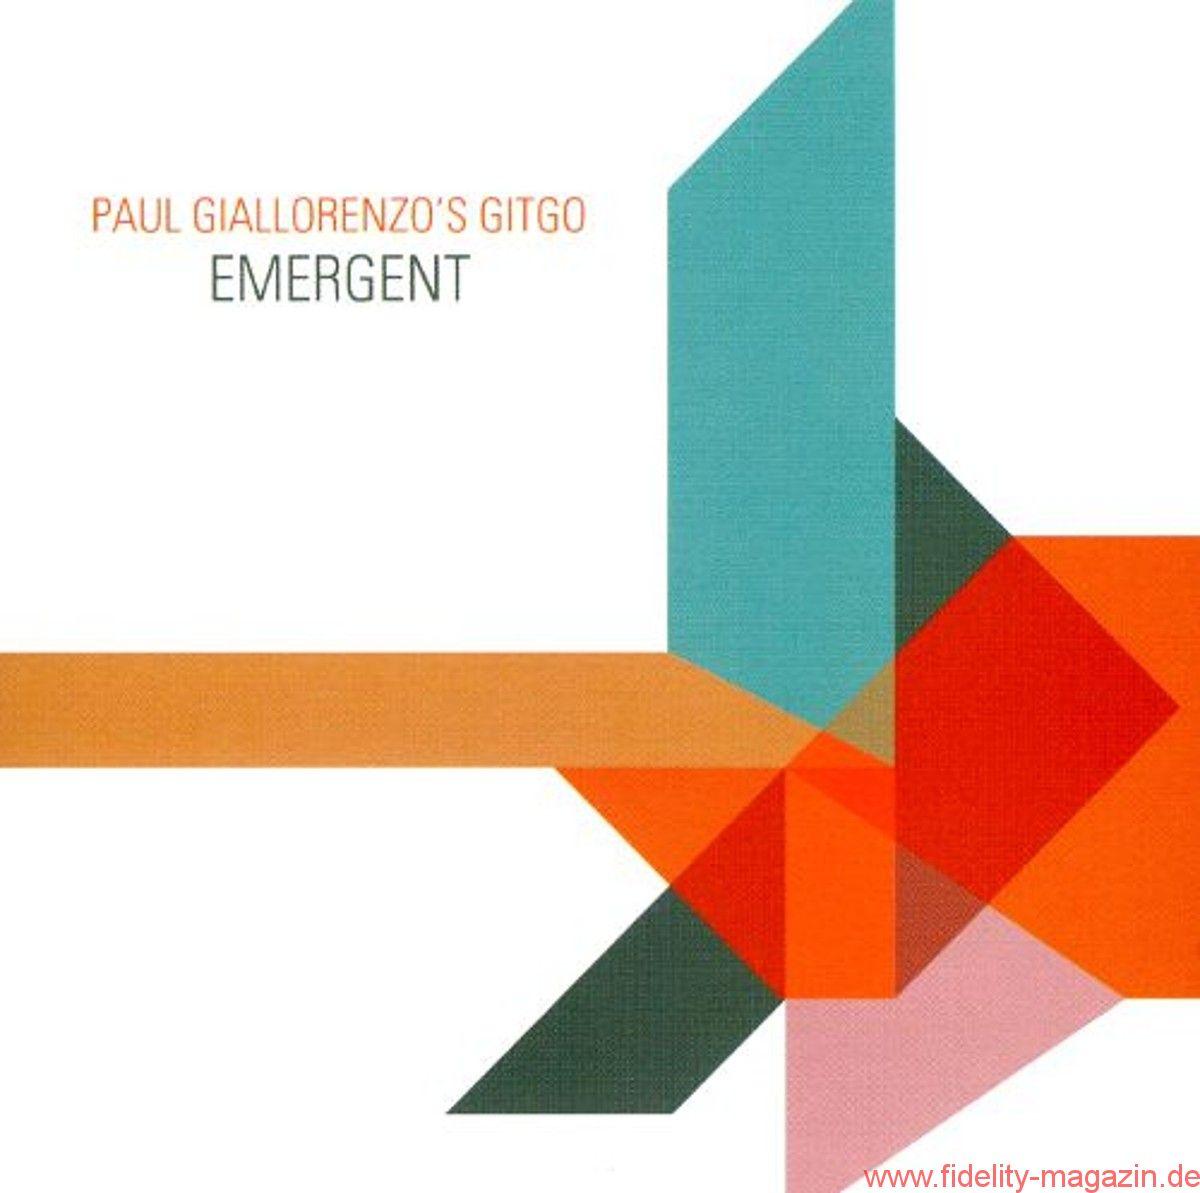 Paul Giallorenzo's Gitgo Emergent